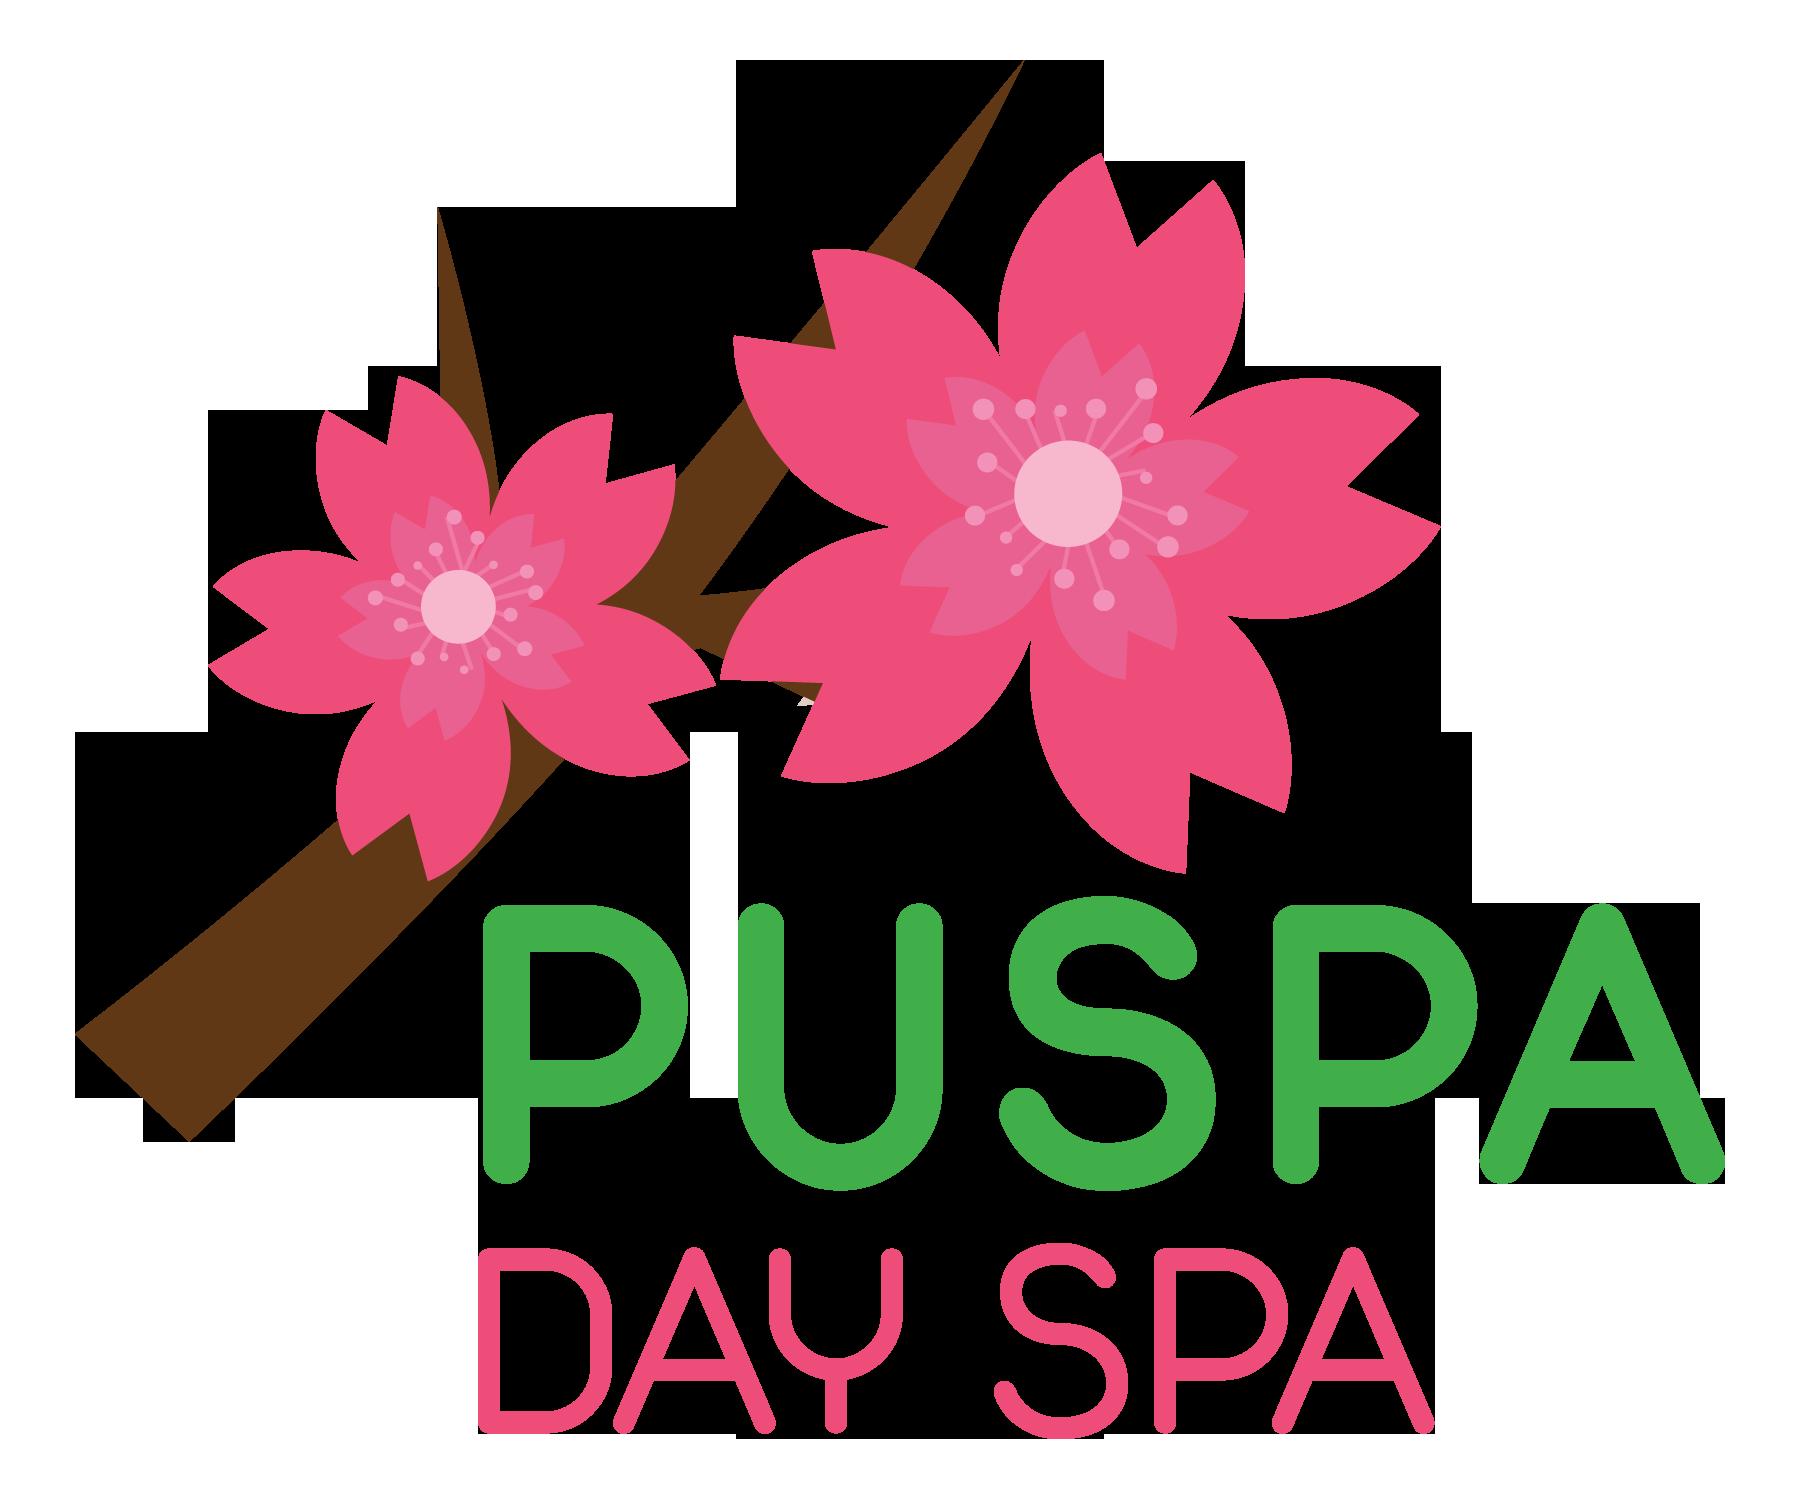 Puspa Day Spa